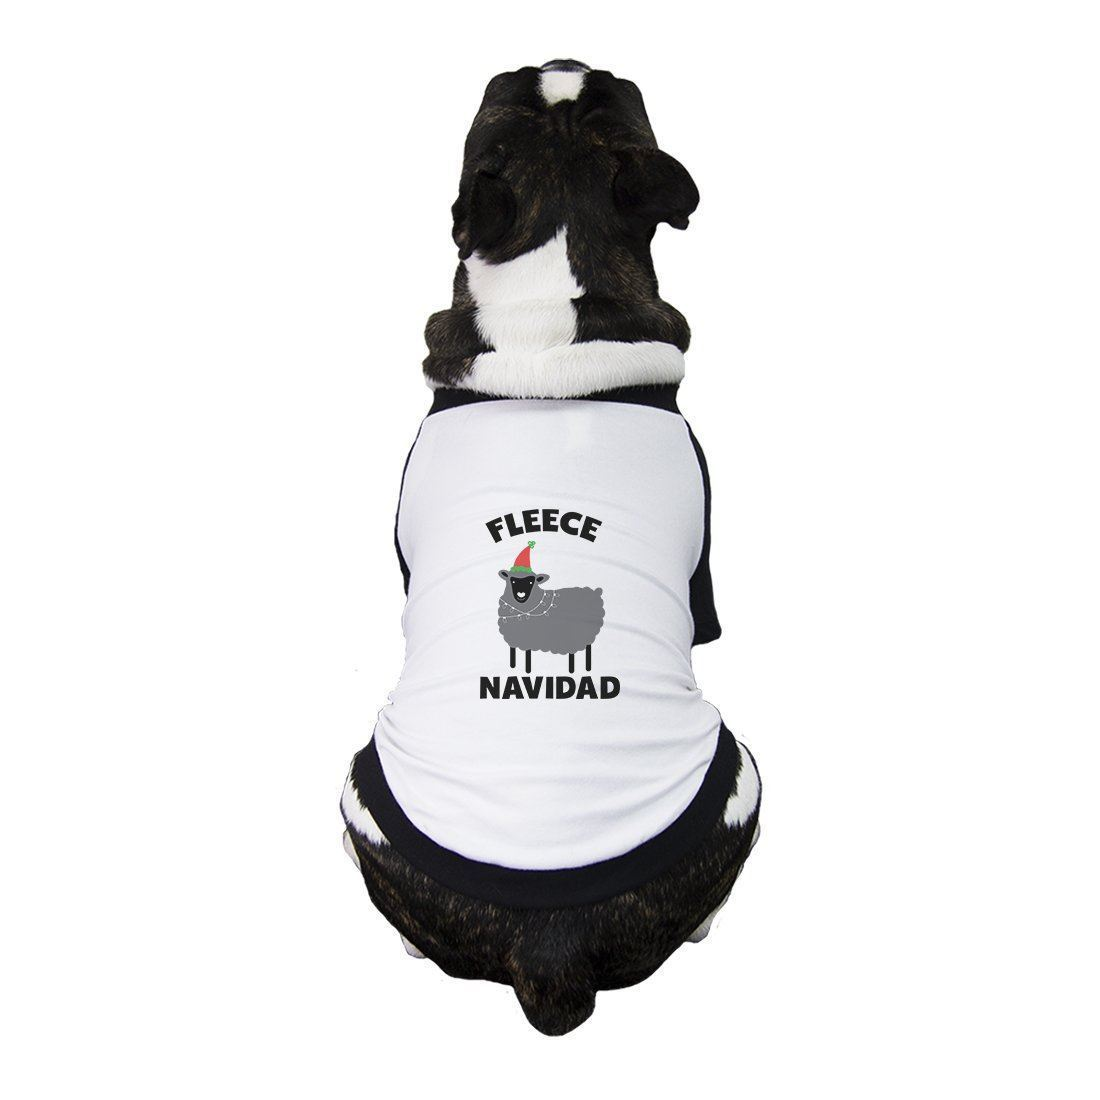 Fleece Navidad Pet Baseball Shirt for Small Dogs Pet Owner Gifts